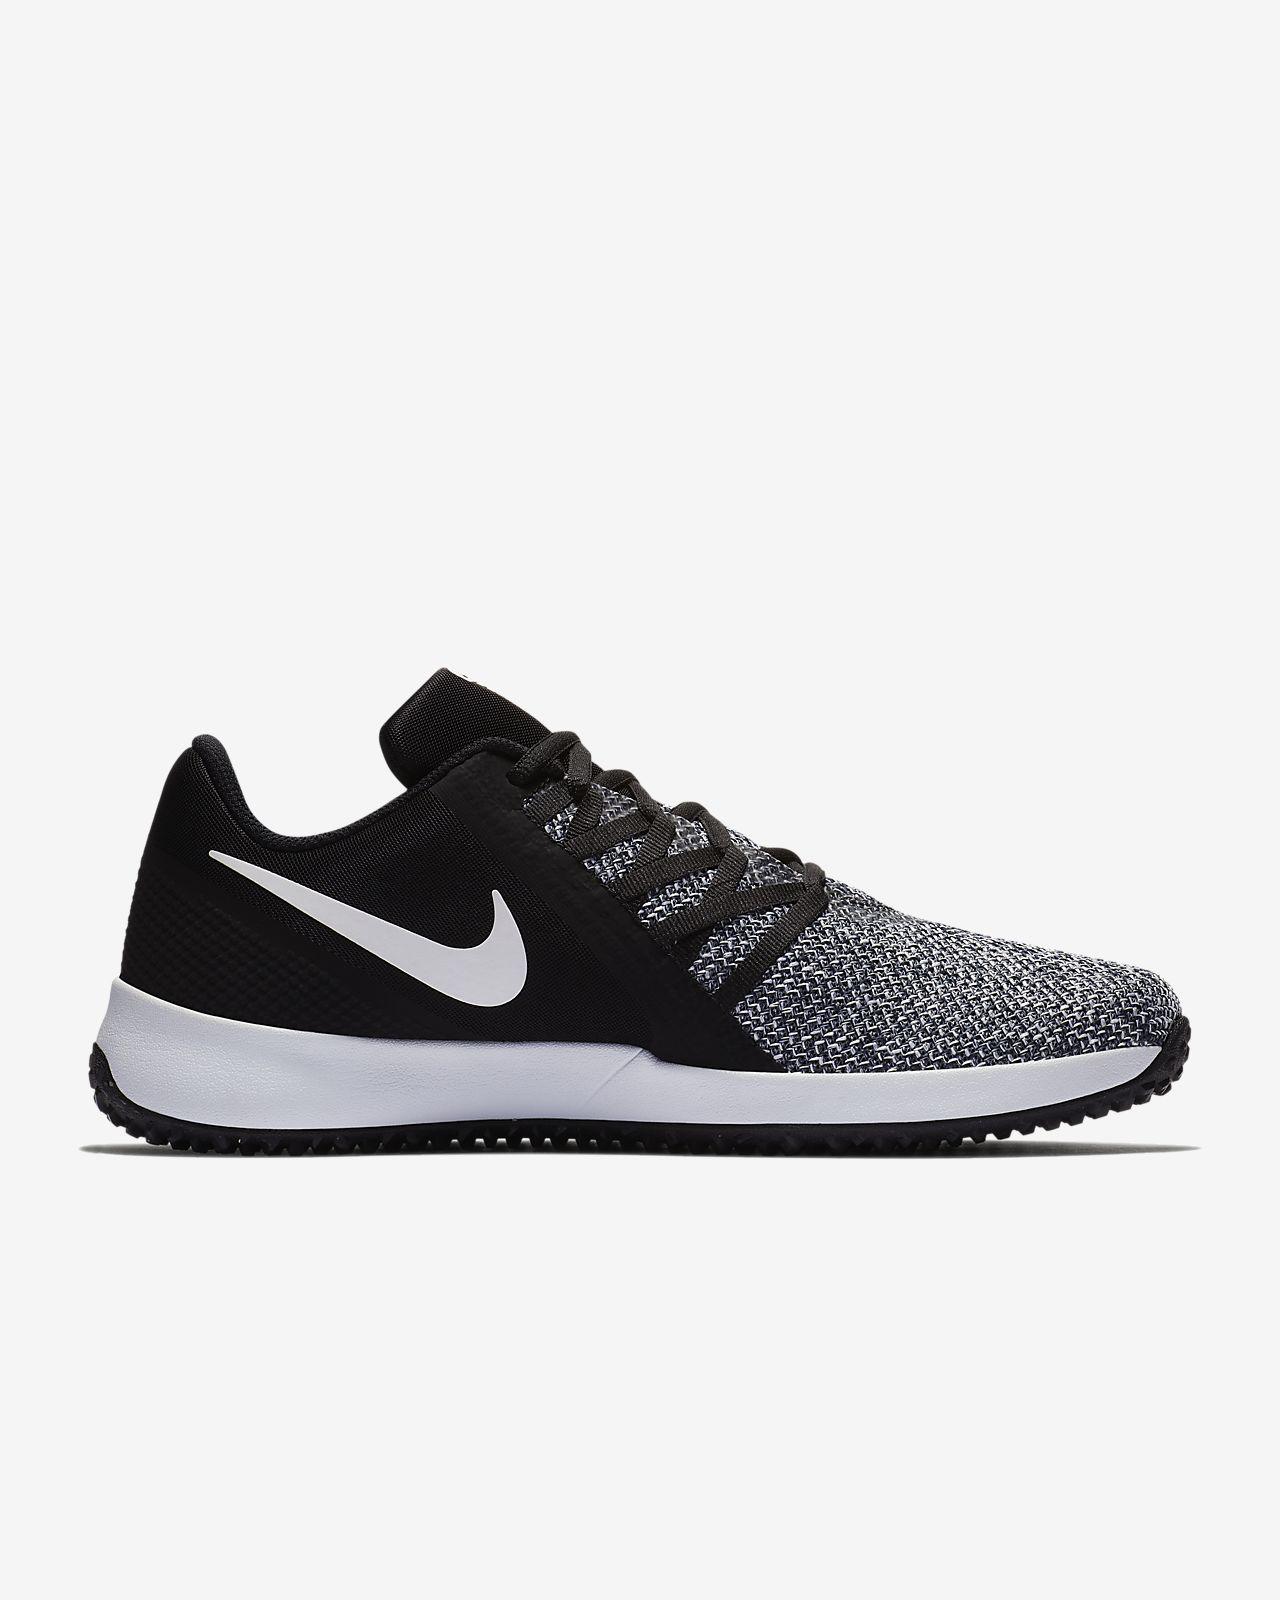 designer fashion d6374 eba89 ... Nike Varsity Compete Trainer Men s Gym Sport Training Shoe (Extra Wide)